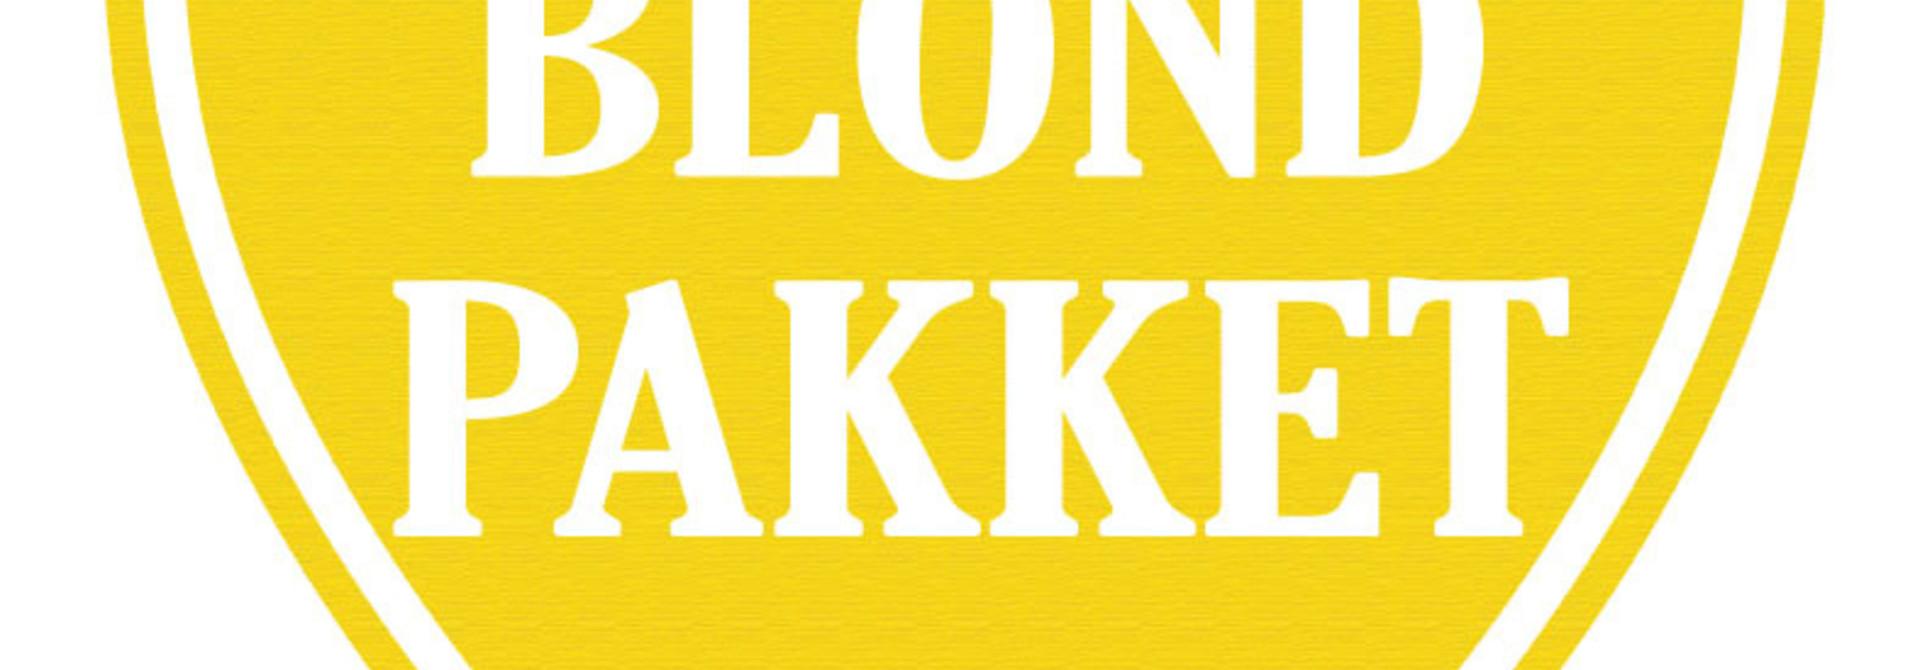 Hellobier blond pakket